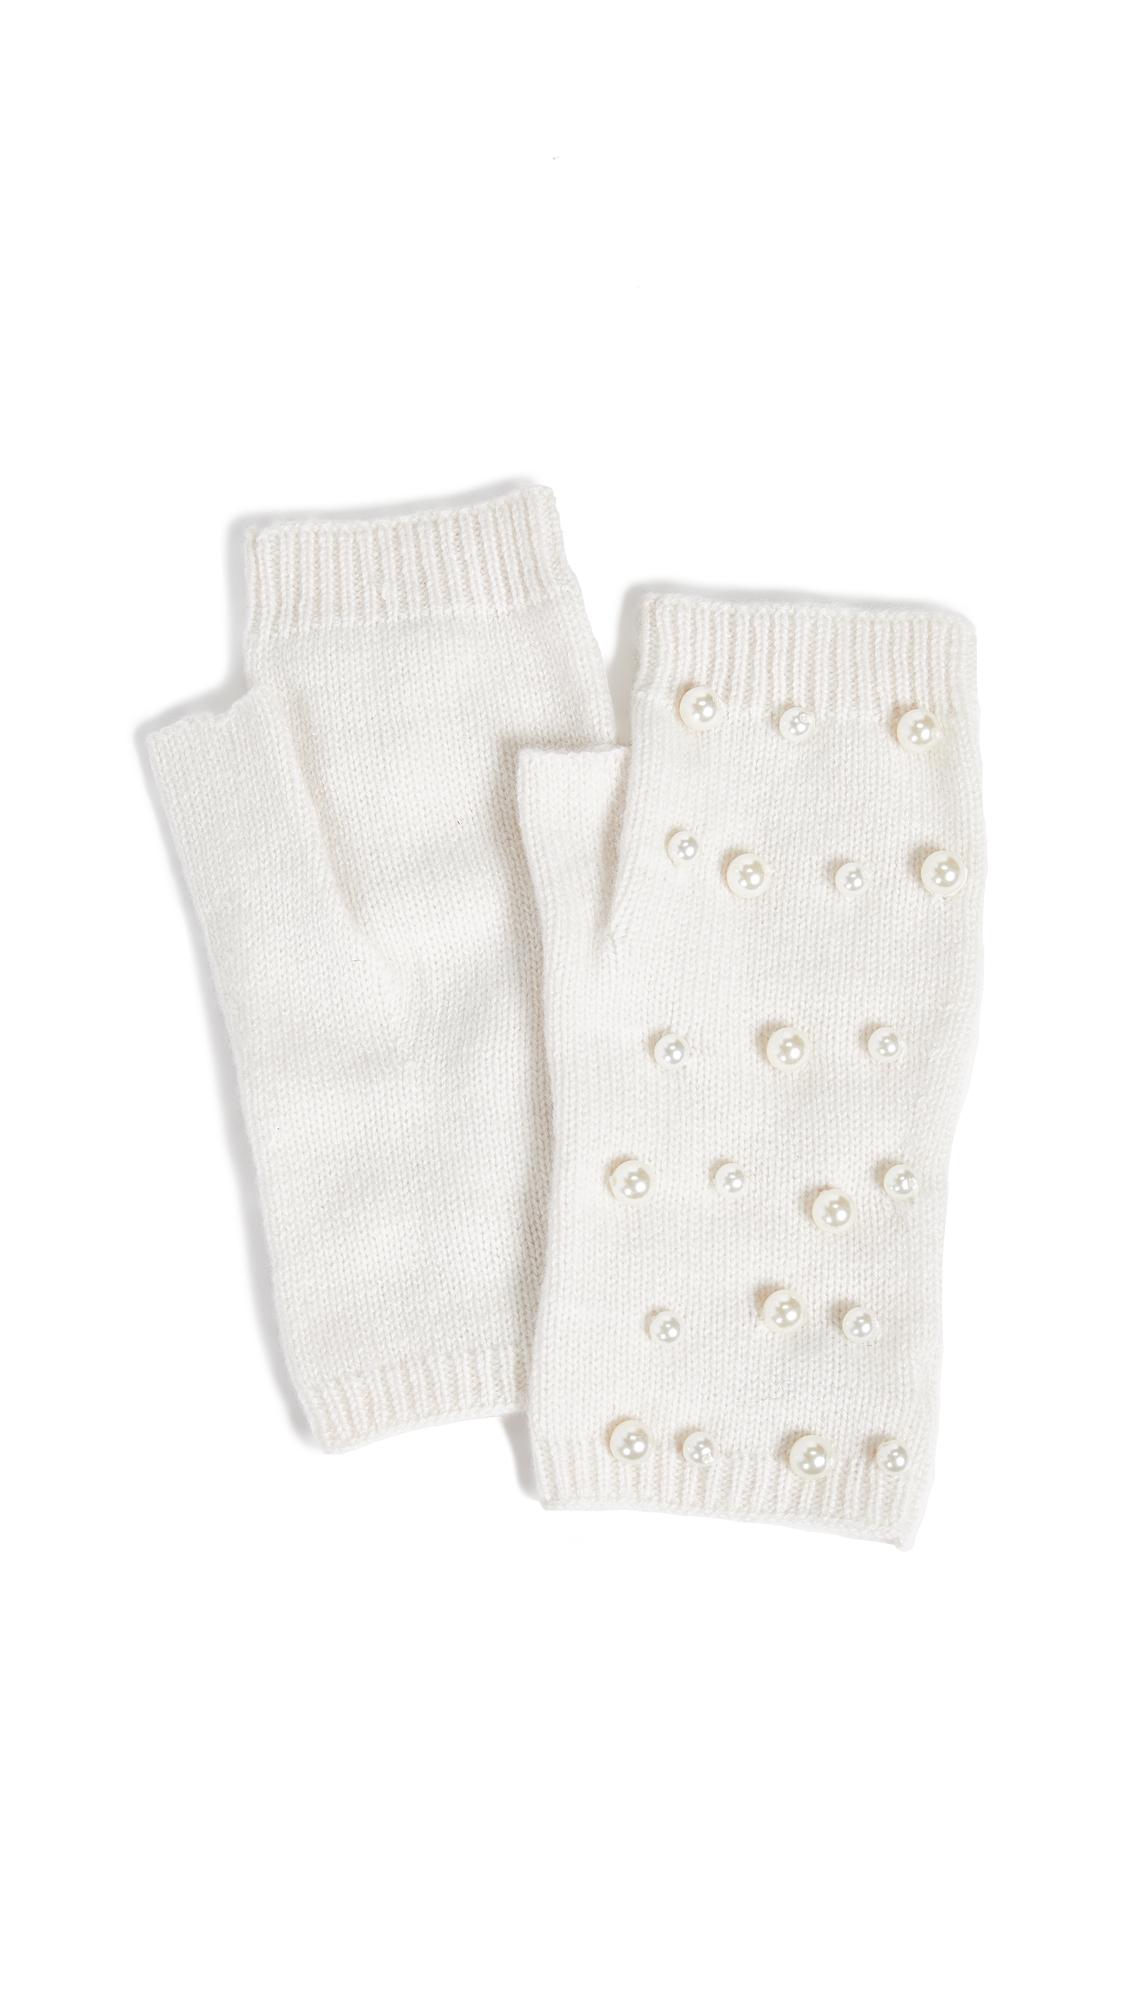 CAROLINA AMATO Imitation Pearl Fingerless Gloves in Ivory